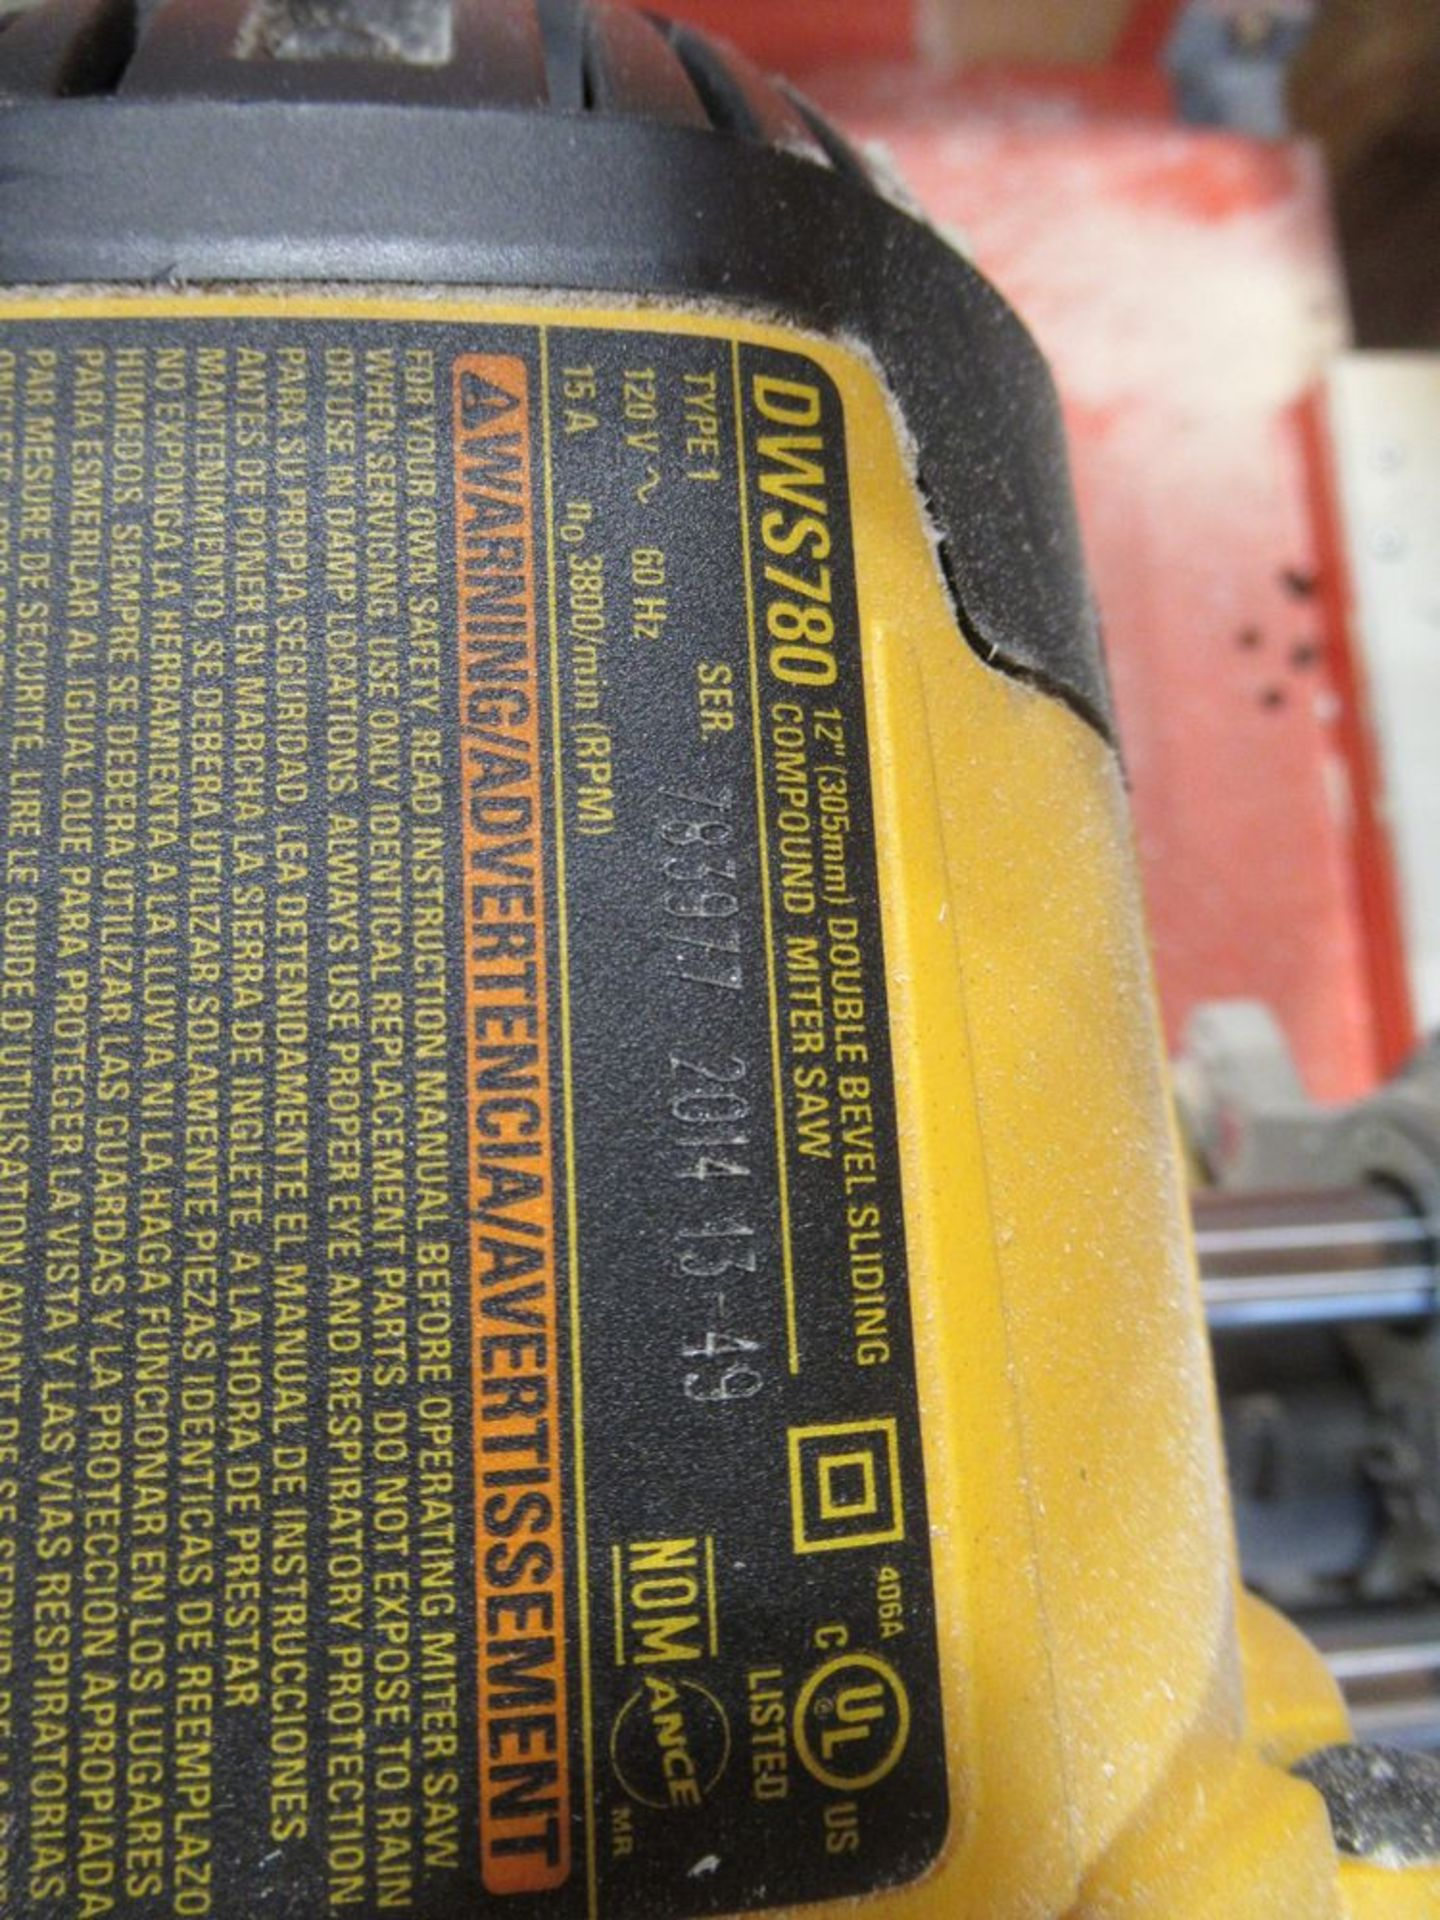 "2014 DEWALT DWS-780 12"" DOUBLE BEVEL COMPOUND SLIDING MITRE SAW, S/N 783977 W/ 24"" X 10' TABLE - Image 4 of 4"